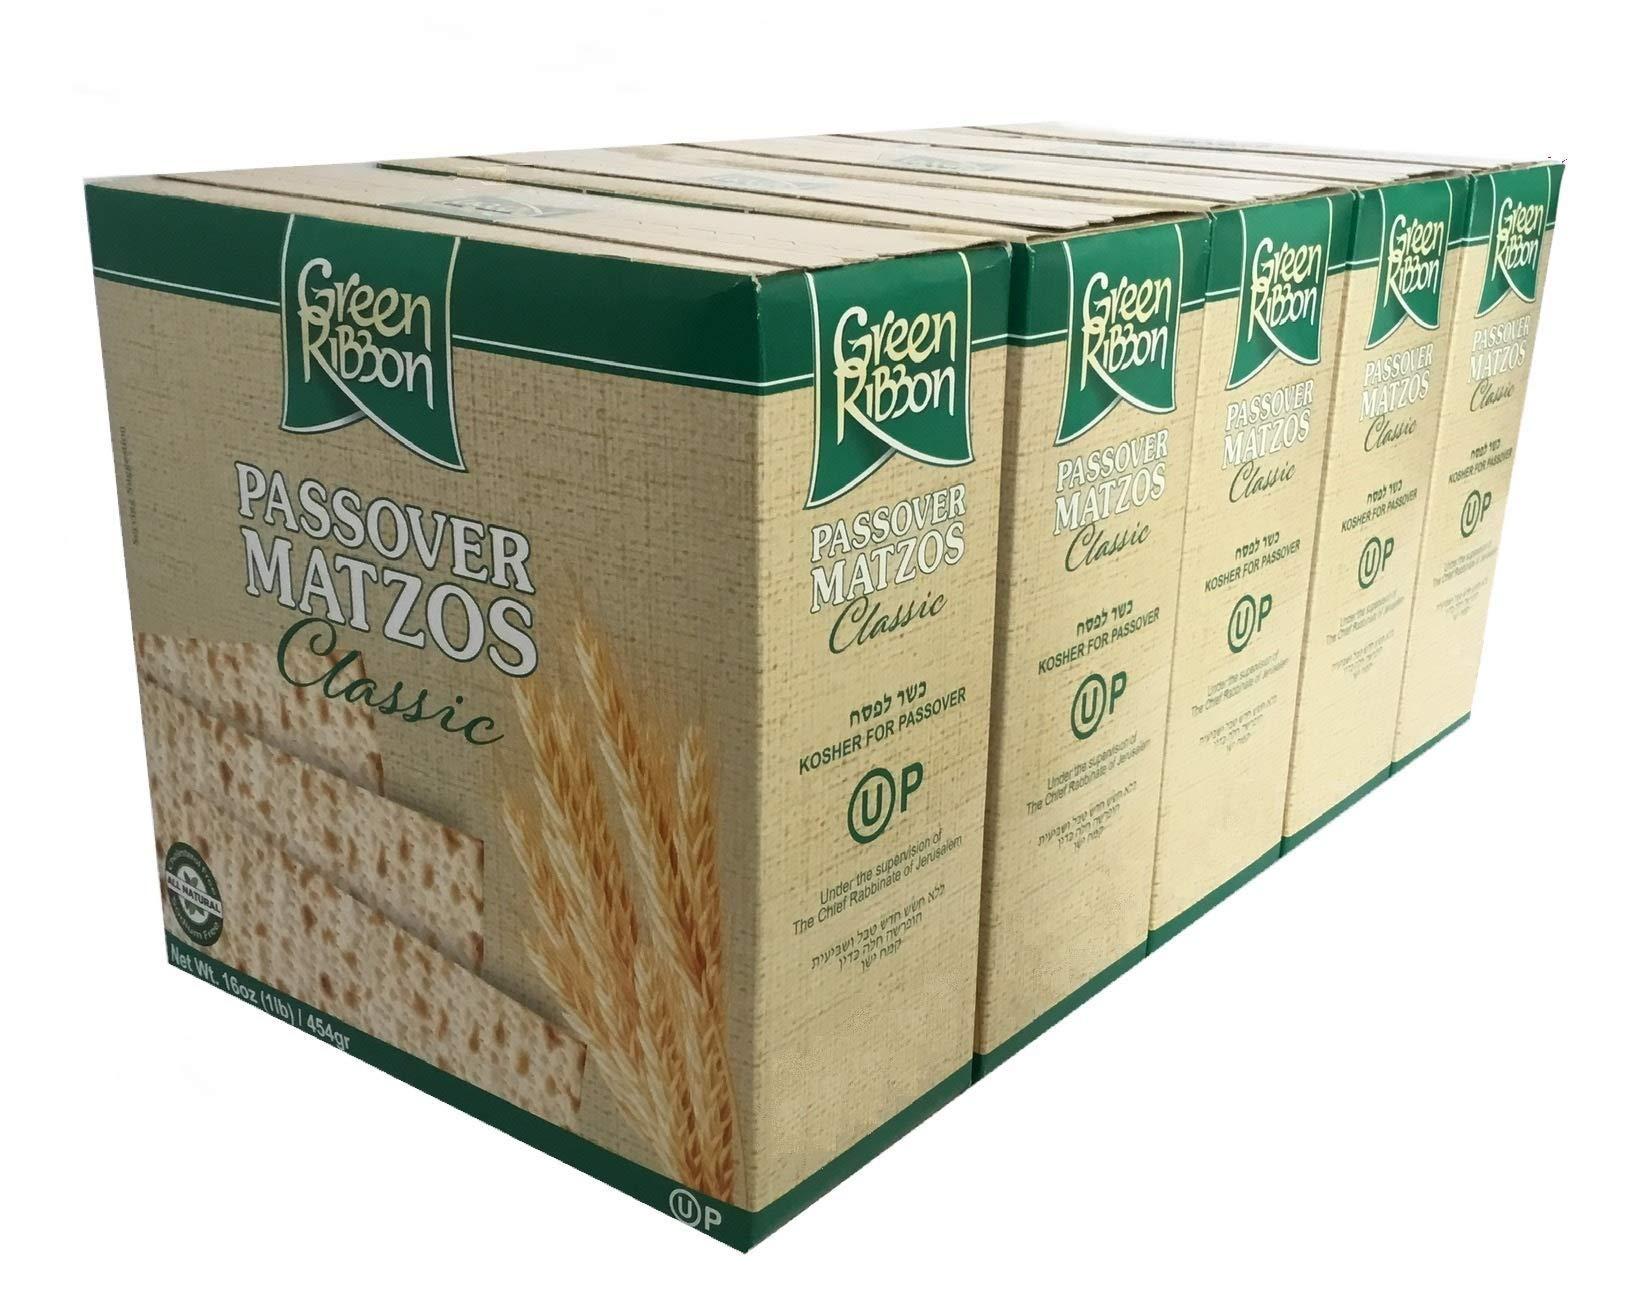 Green Ribbon Passover Matzo 5-1LB Boxes